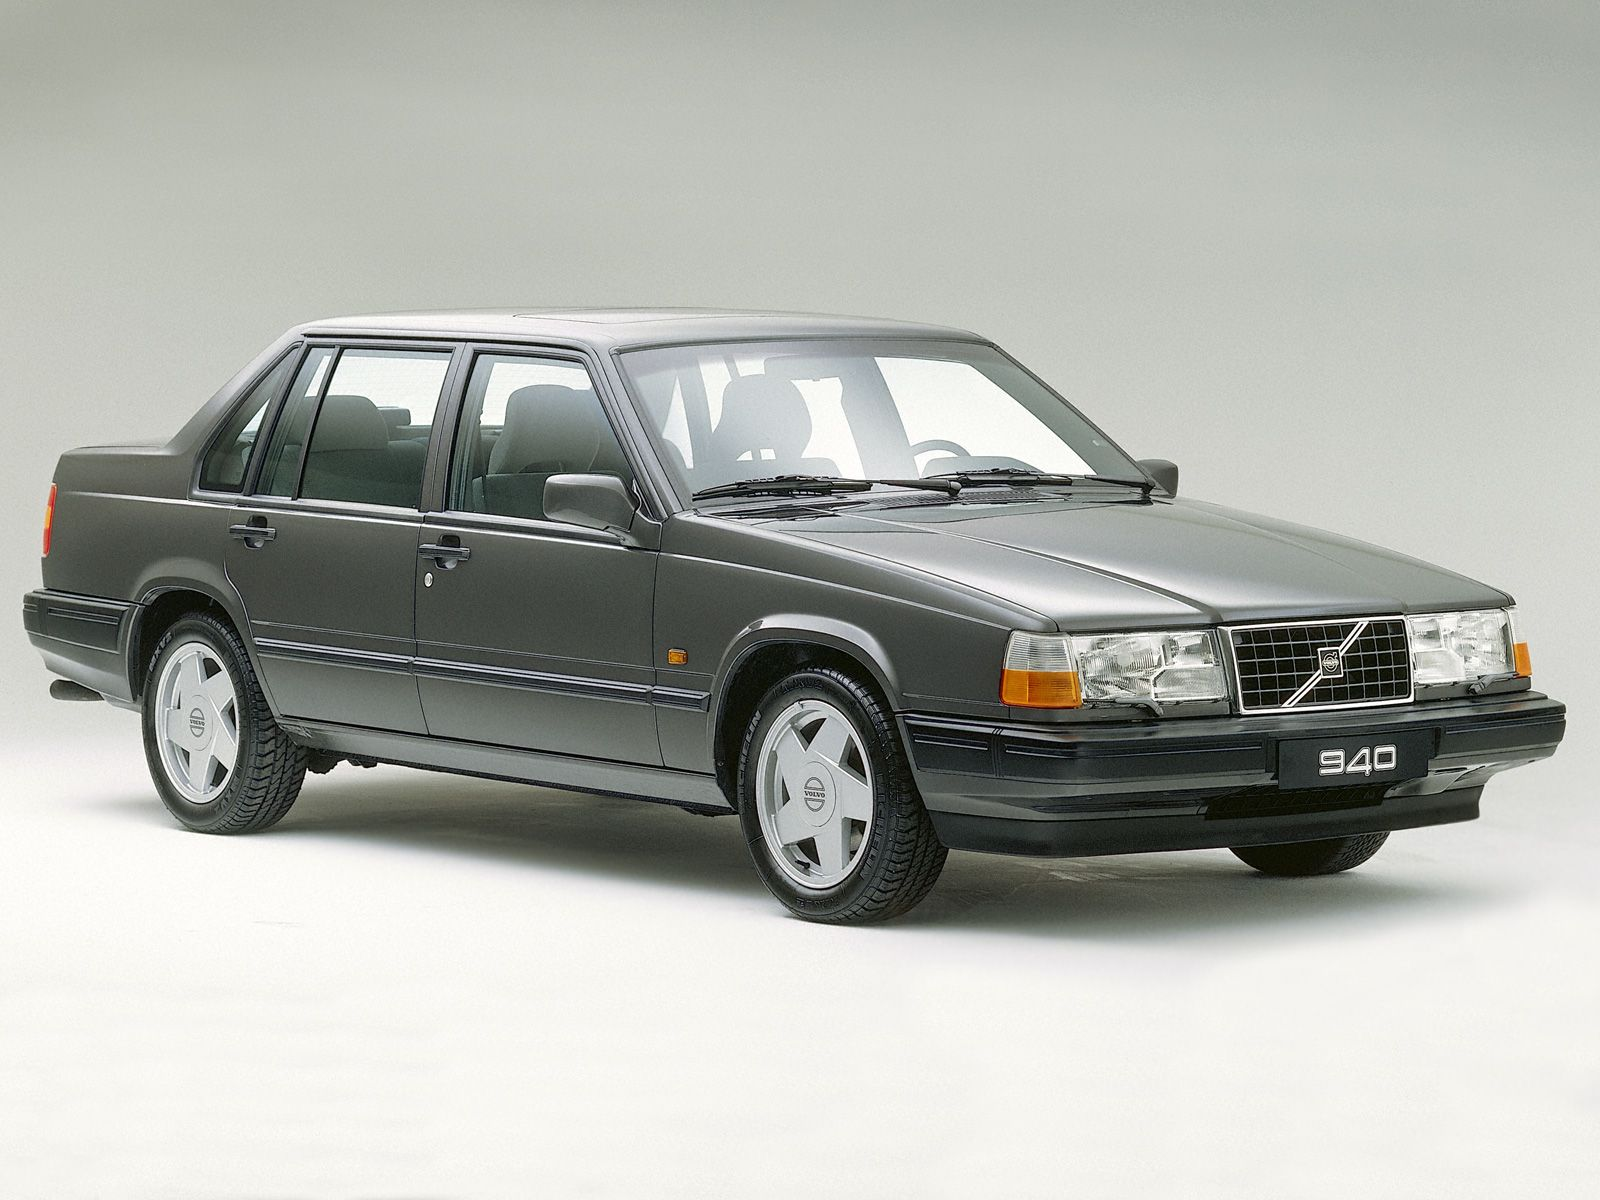 volvo 940 volvo pinterest volvo cars and volvo cars rh pinterest com 1994 Volvo 940 Electrical 1994 volvo 960 owners manual